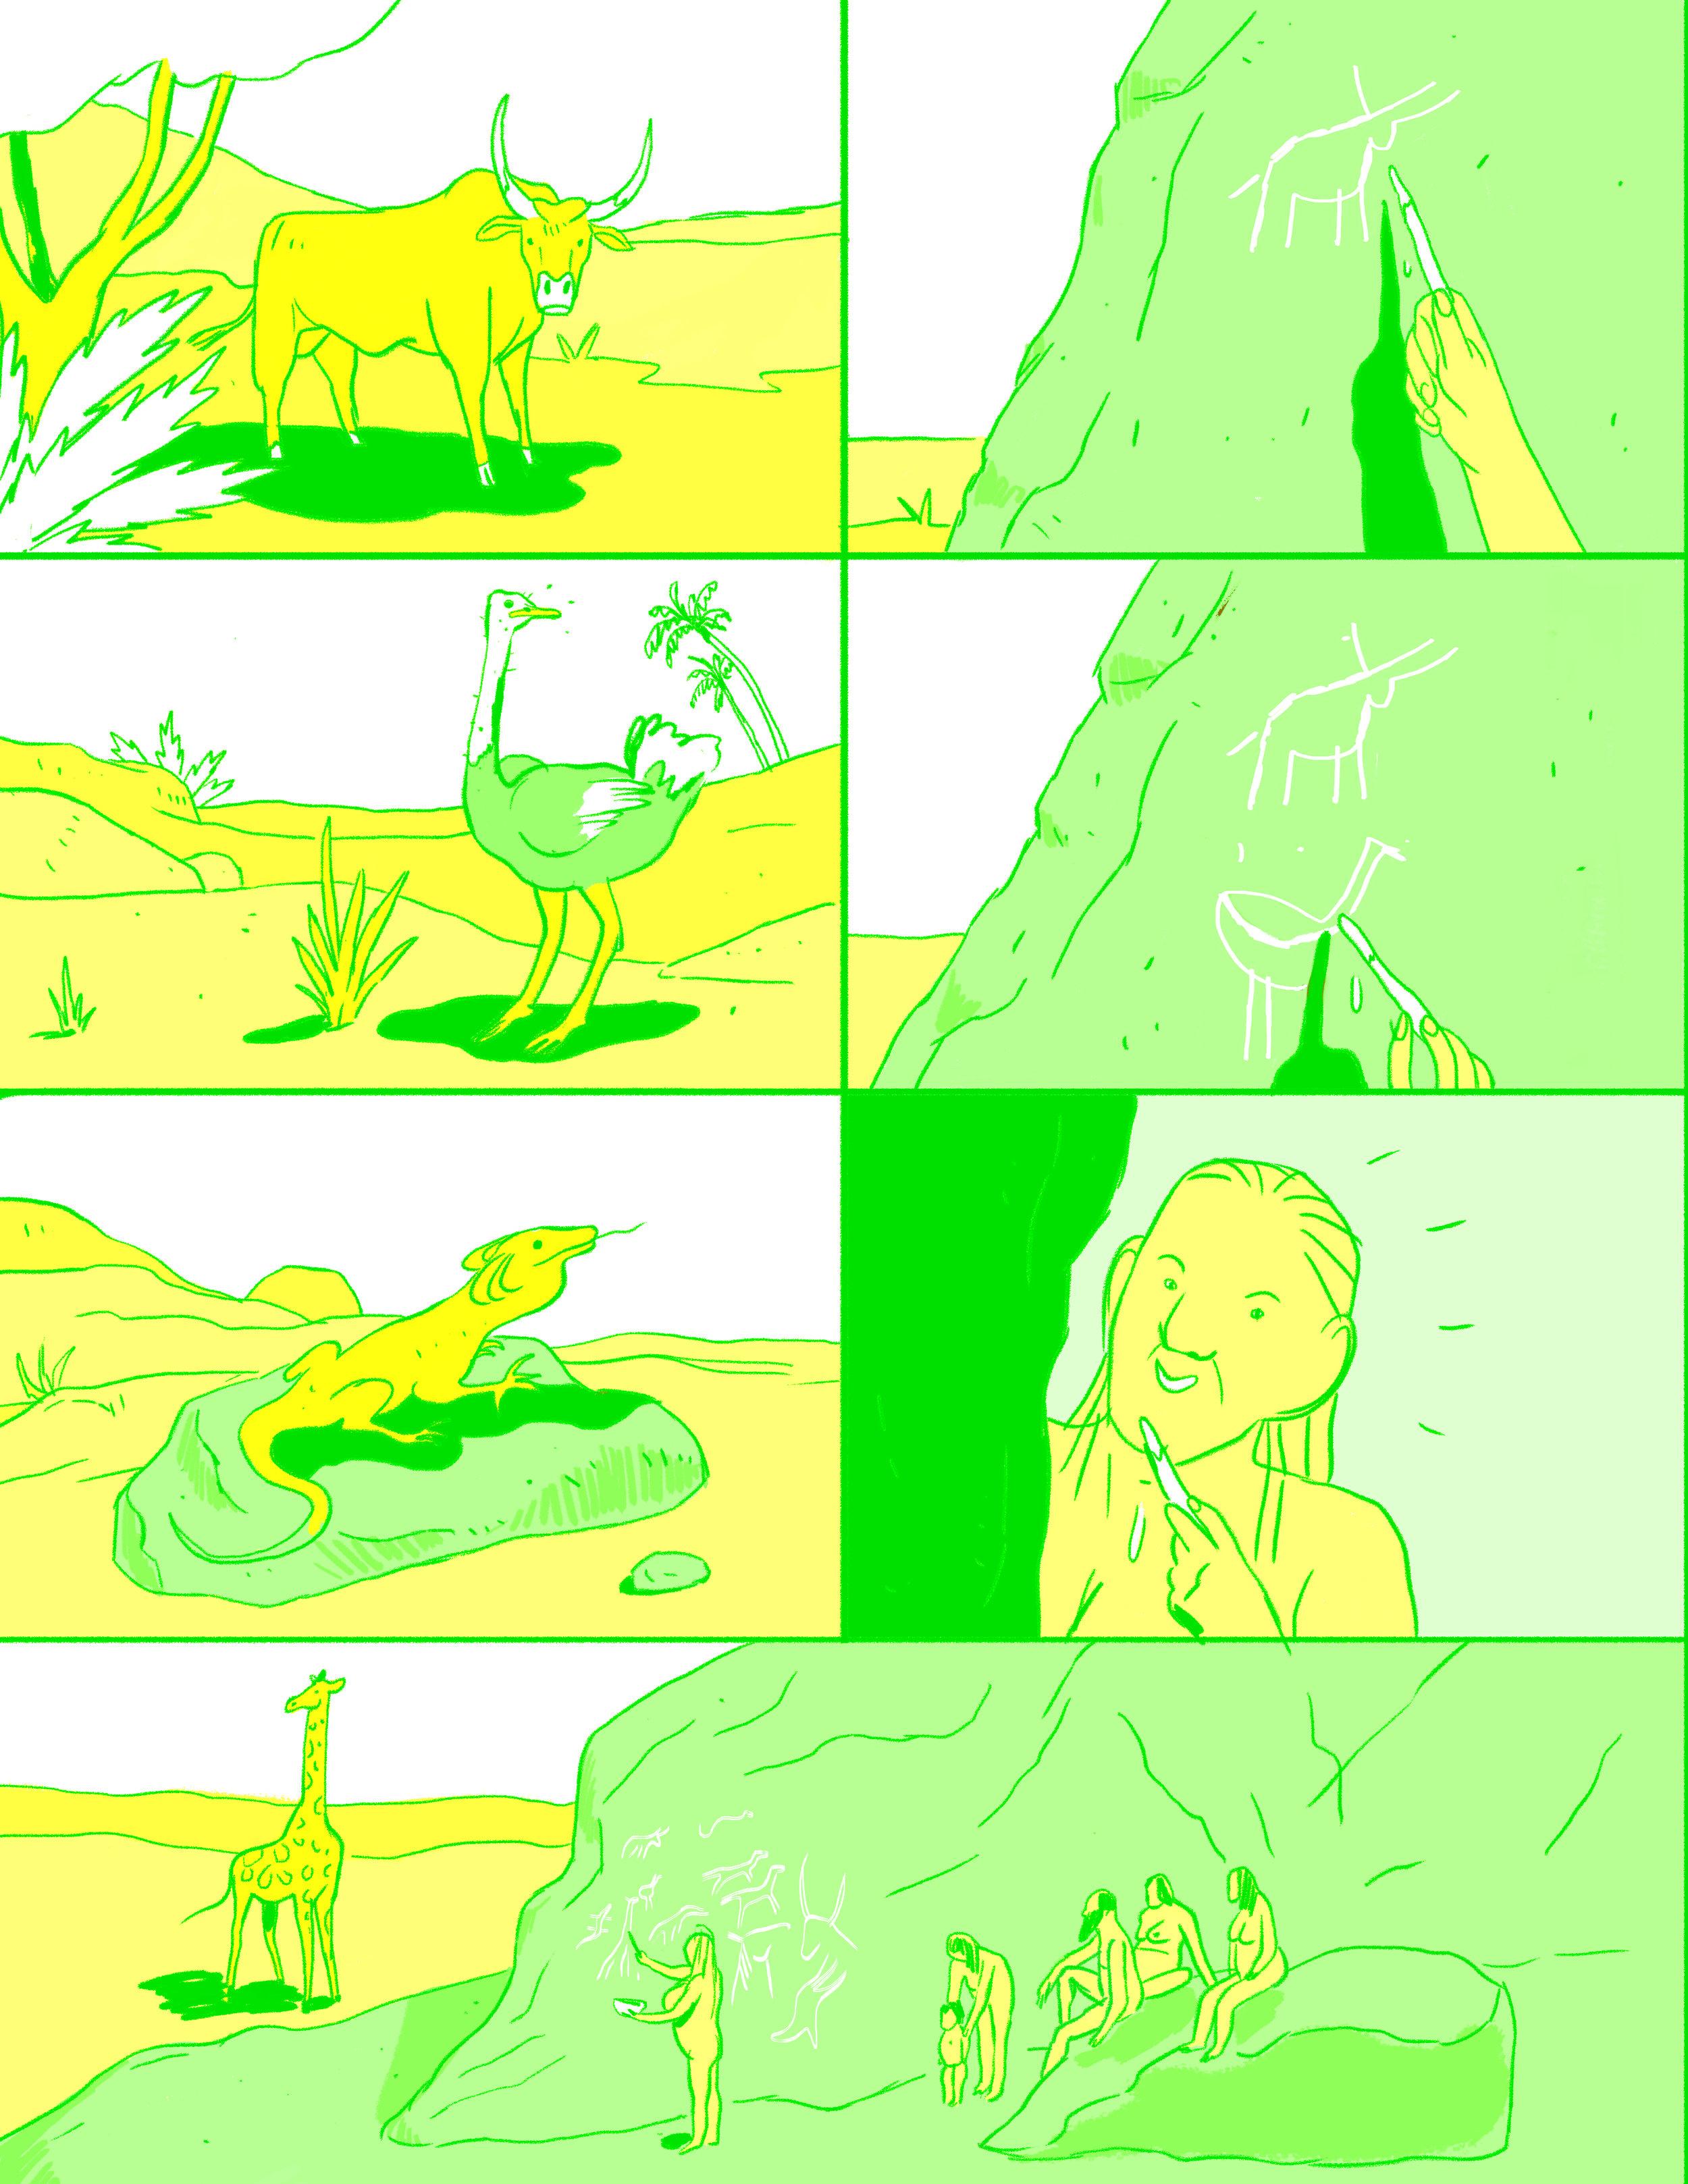 2_sound is a horse.jpg